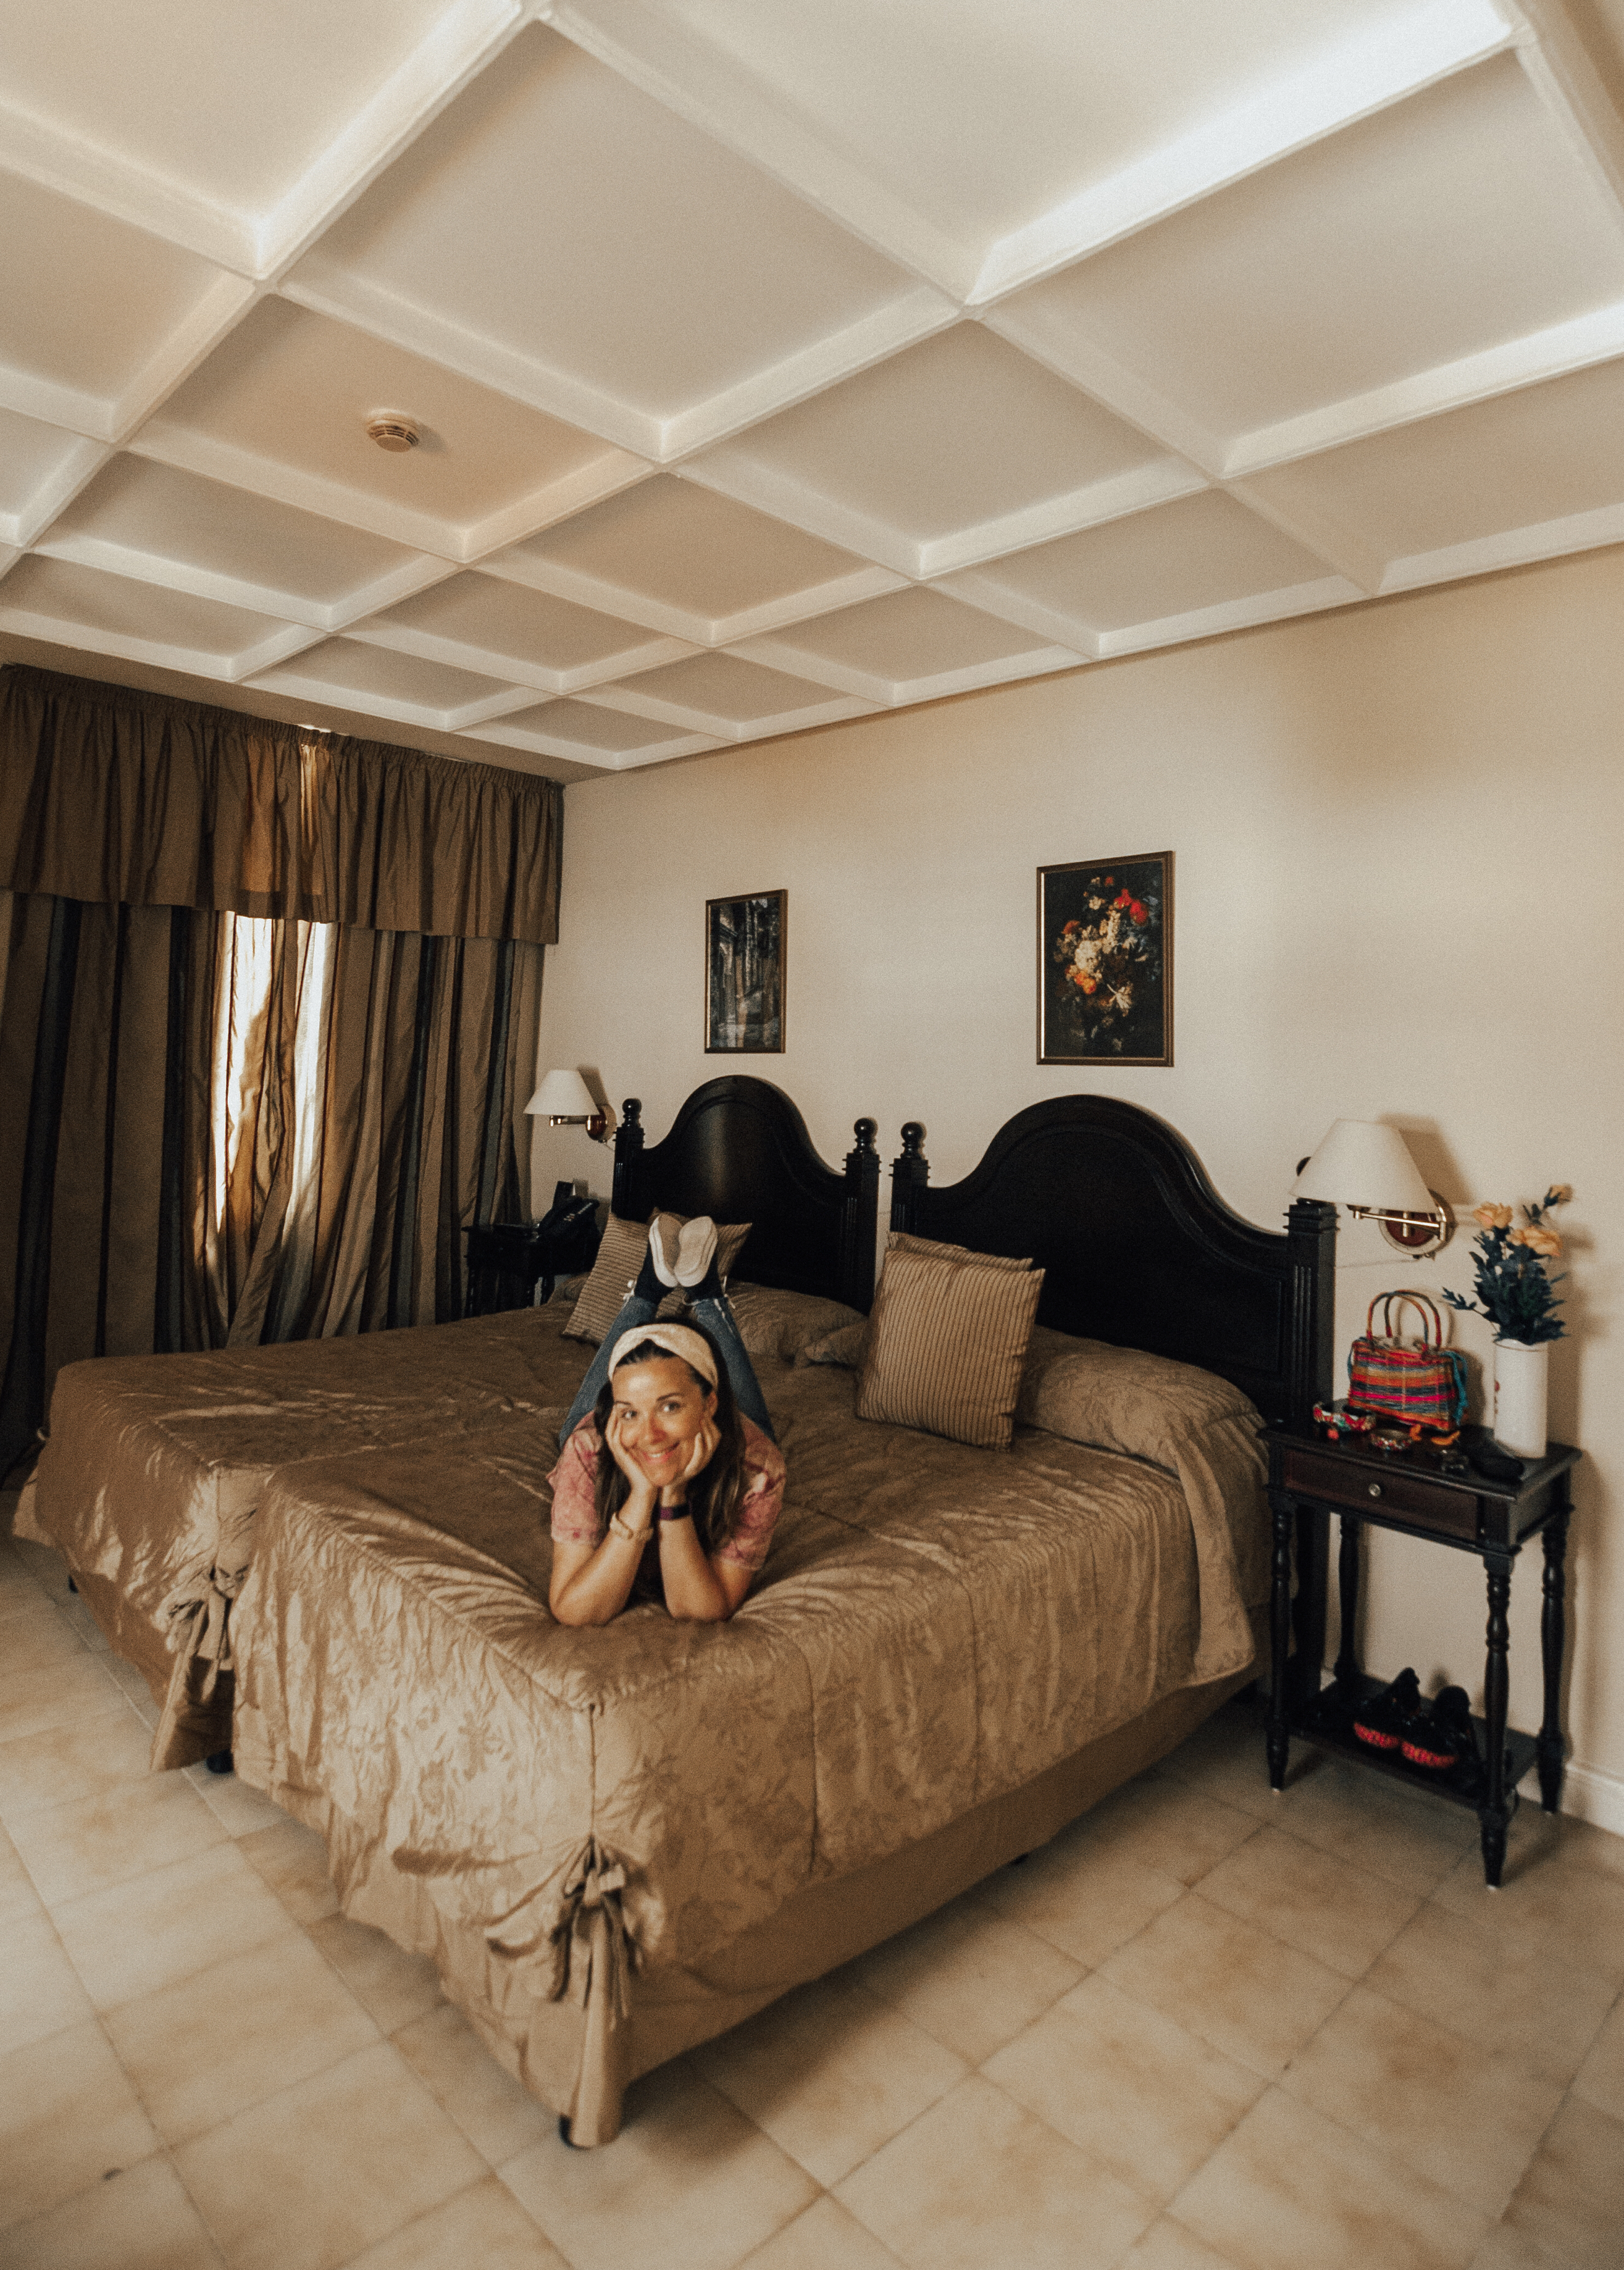 la habana-hotel-nacional-cuba-look-streetstyle